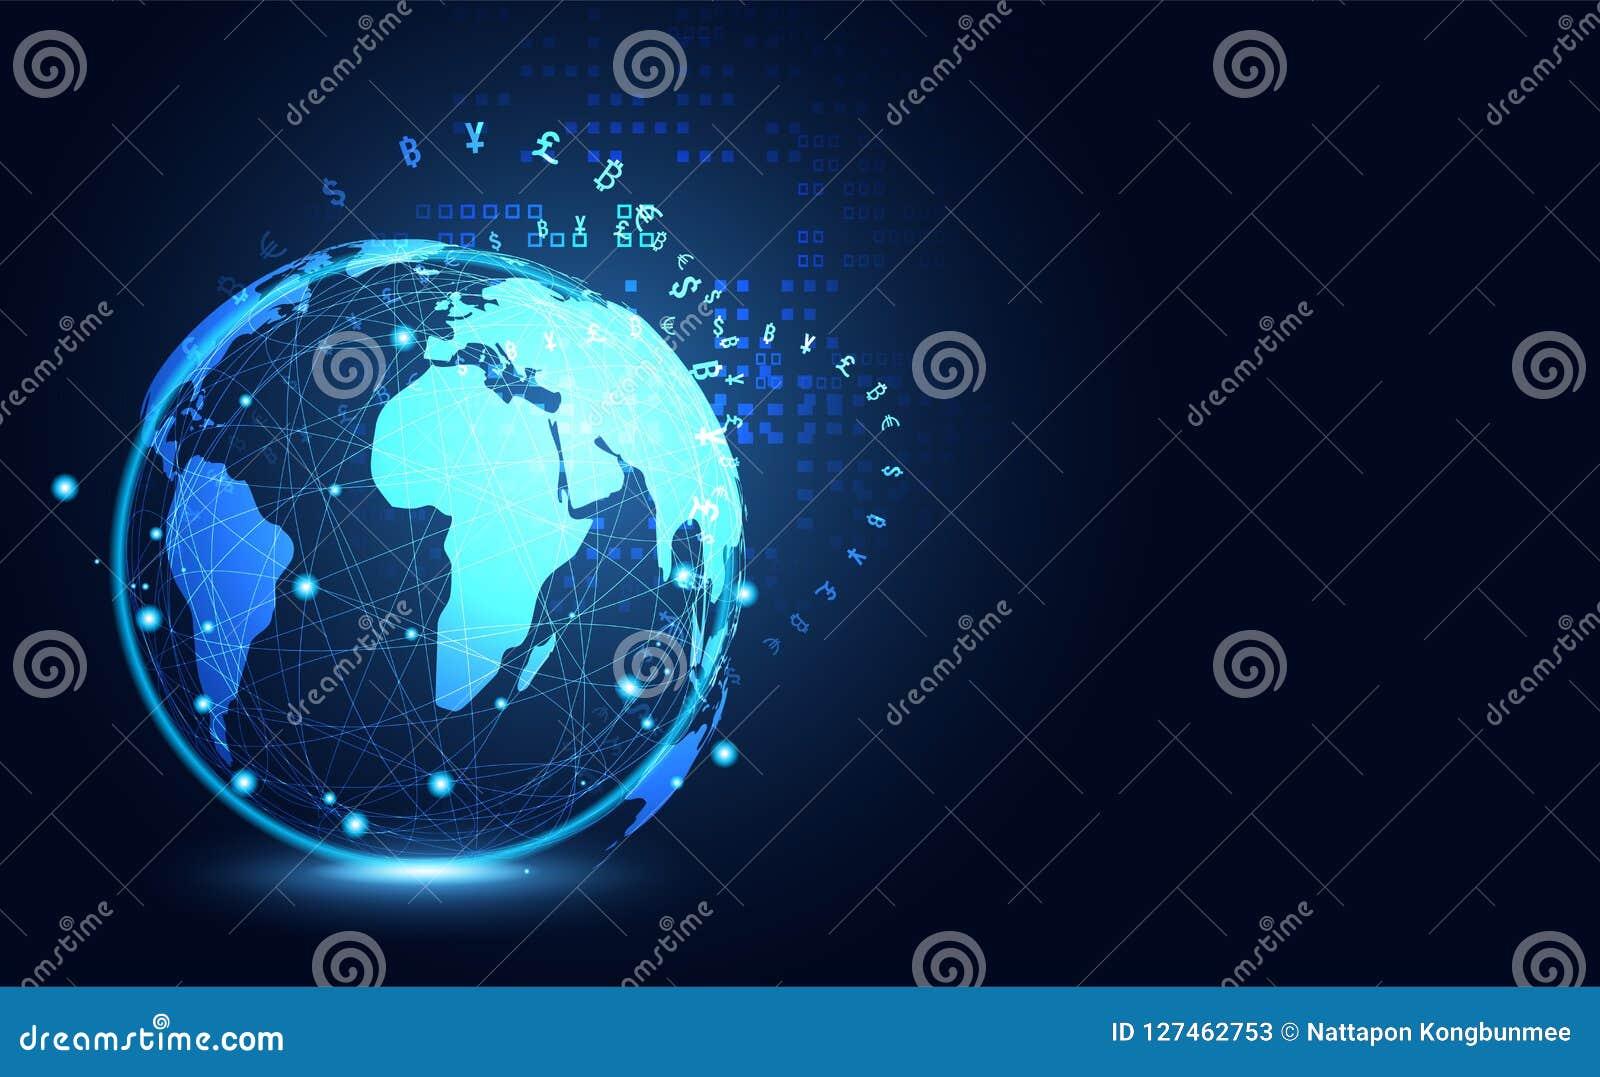 Globales digitales Schlüssel abstrakter großer Datenaustausch Technologie